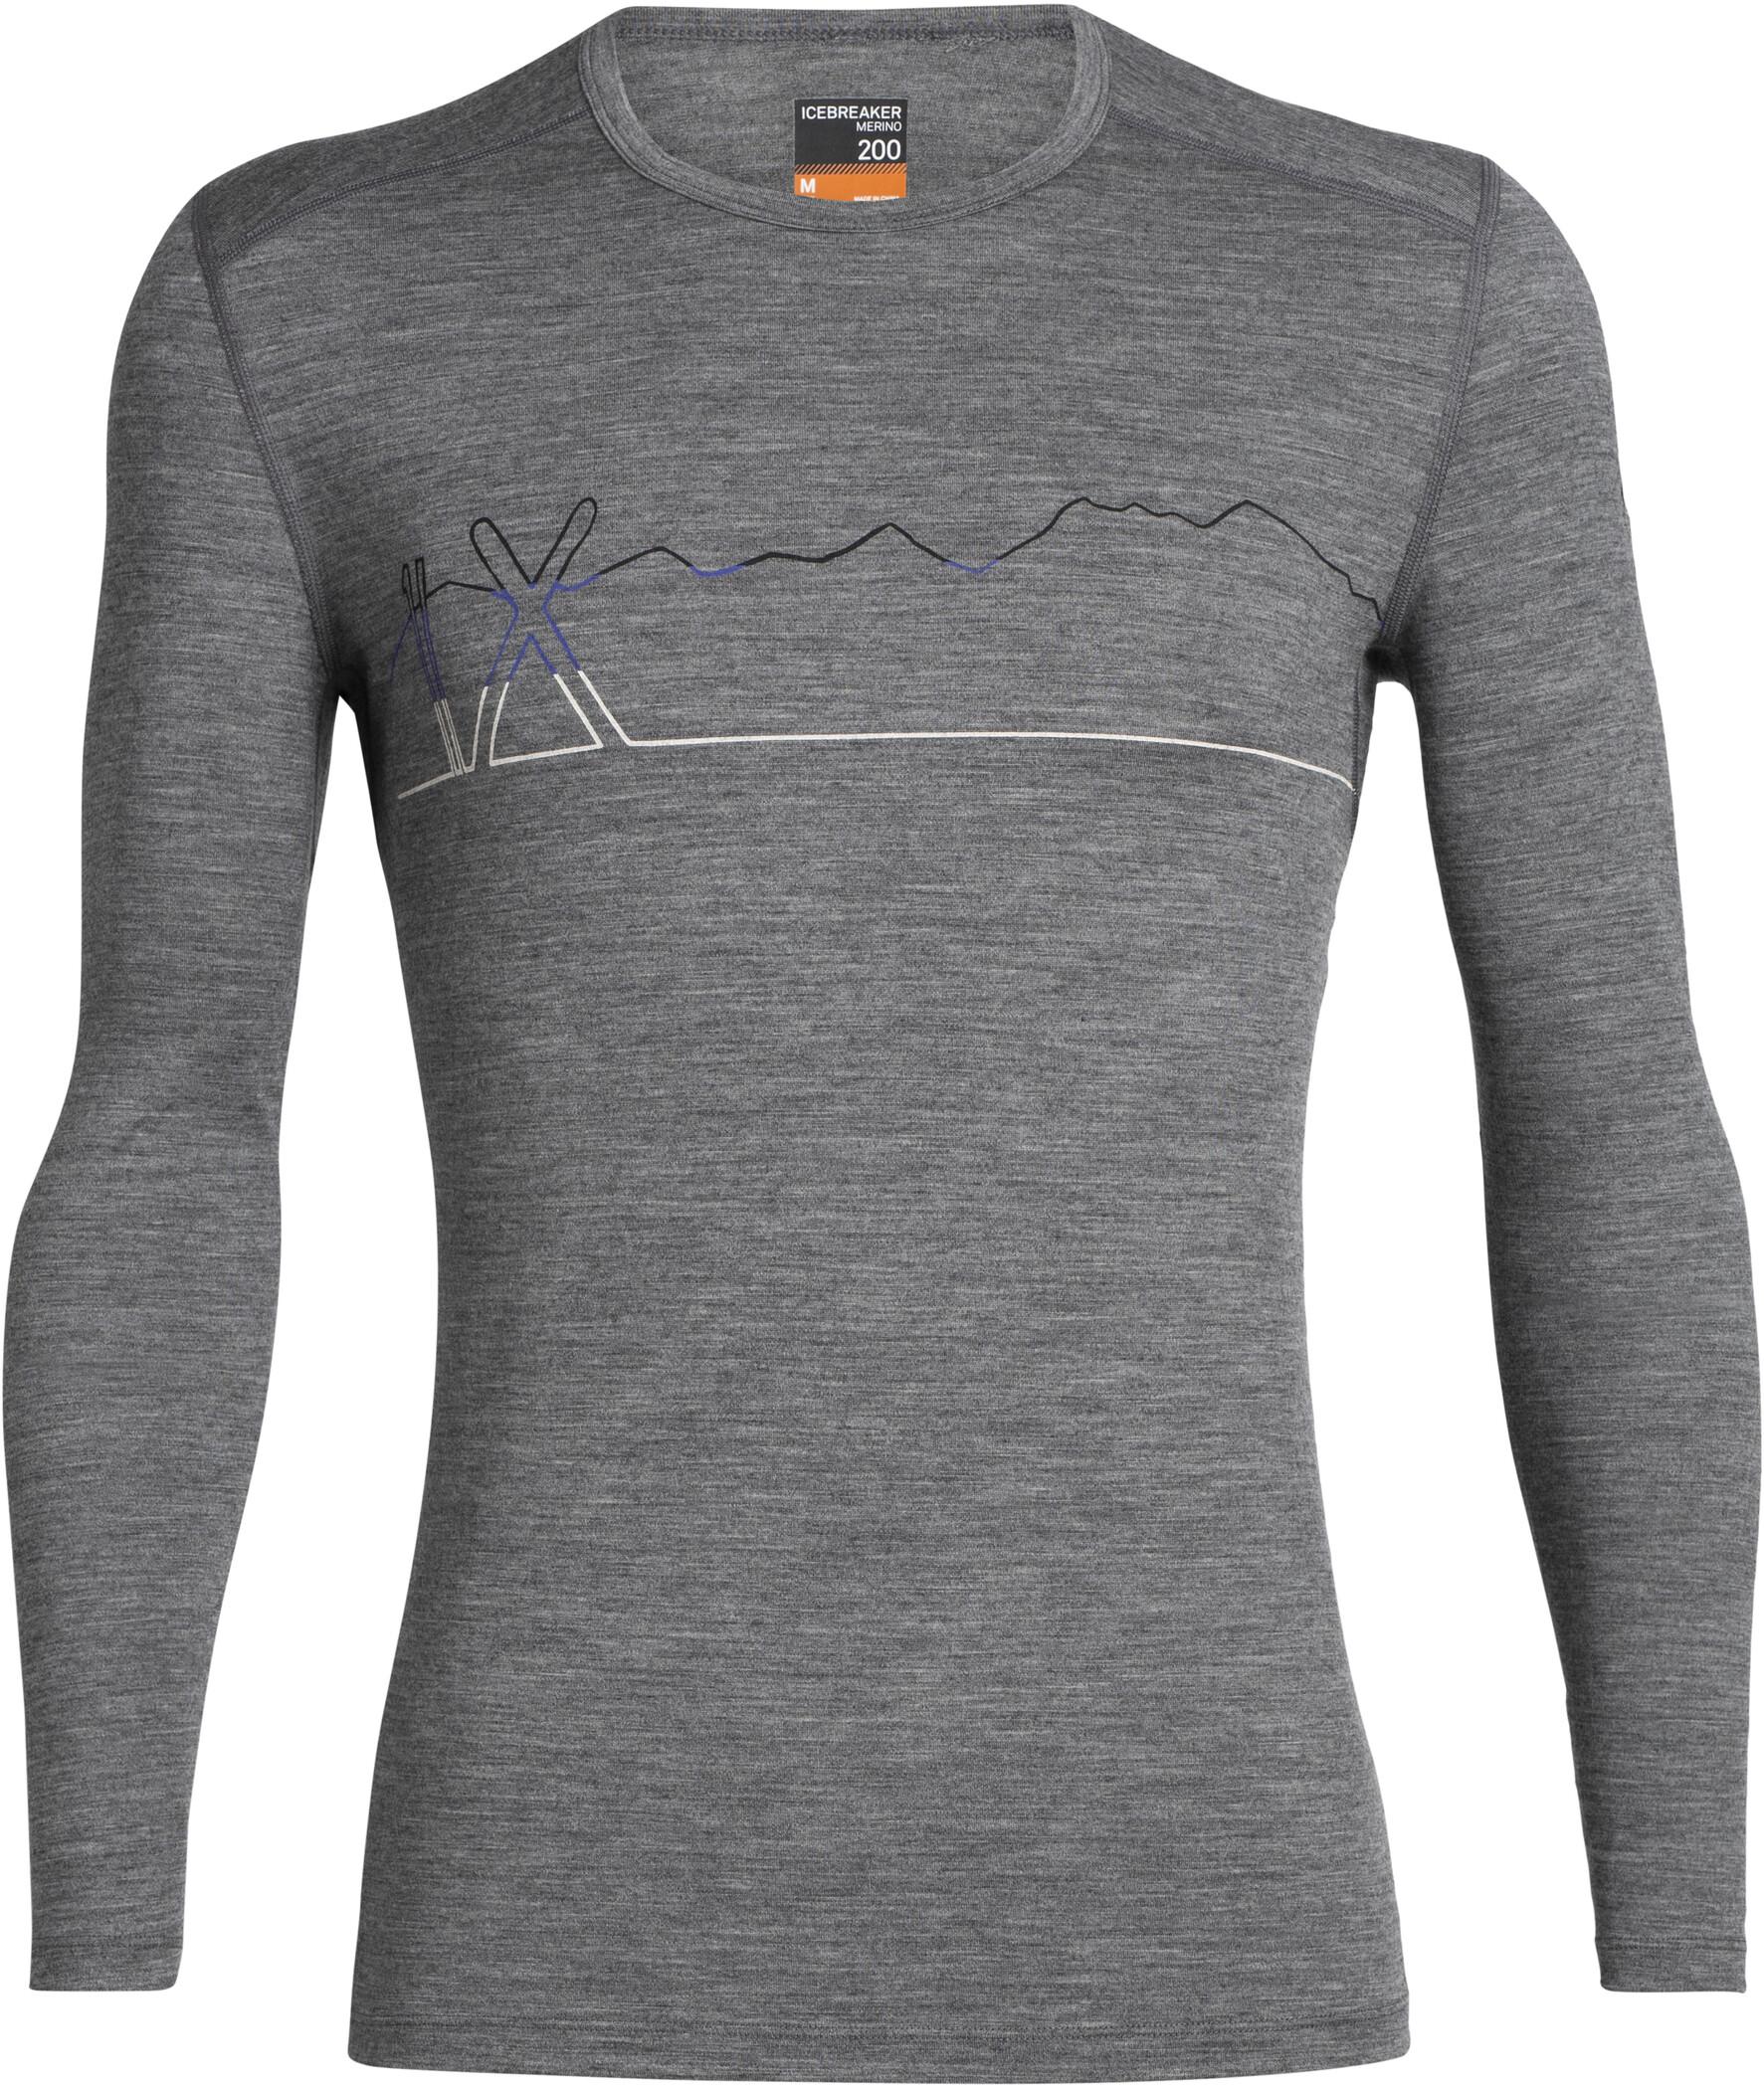 Icebreaker 200 Oasis Single Line Ski Langærmet T-shirt Herrer, gritstone heather (2019) | Base layers